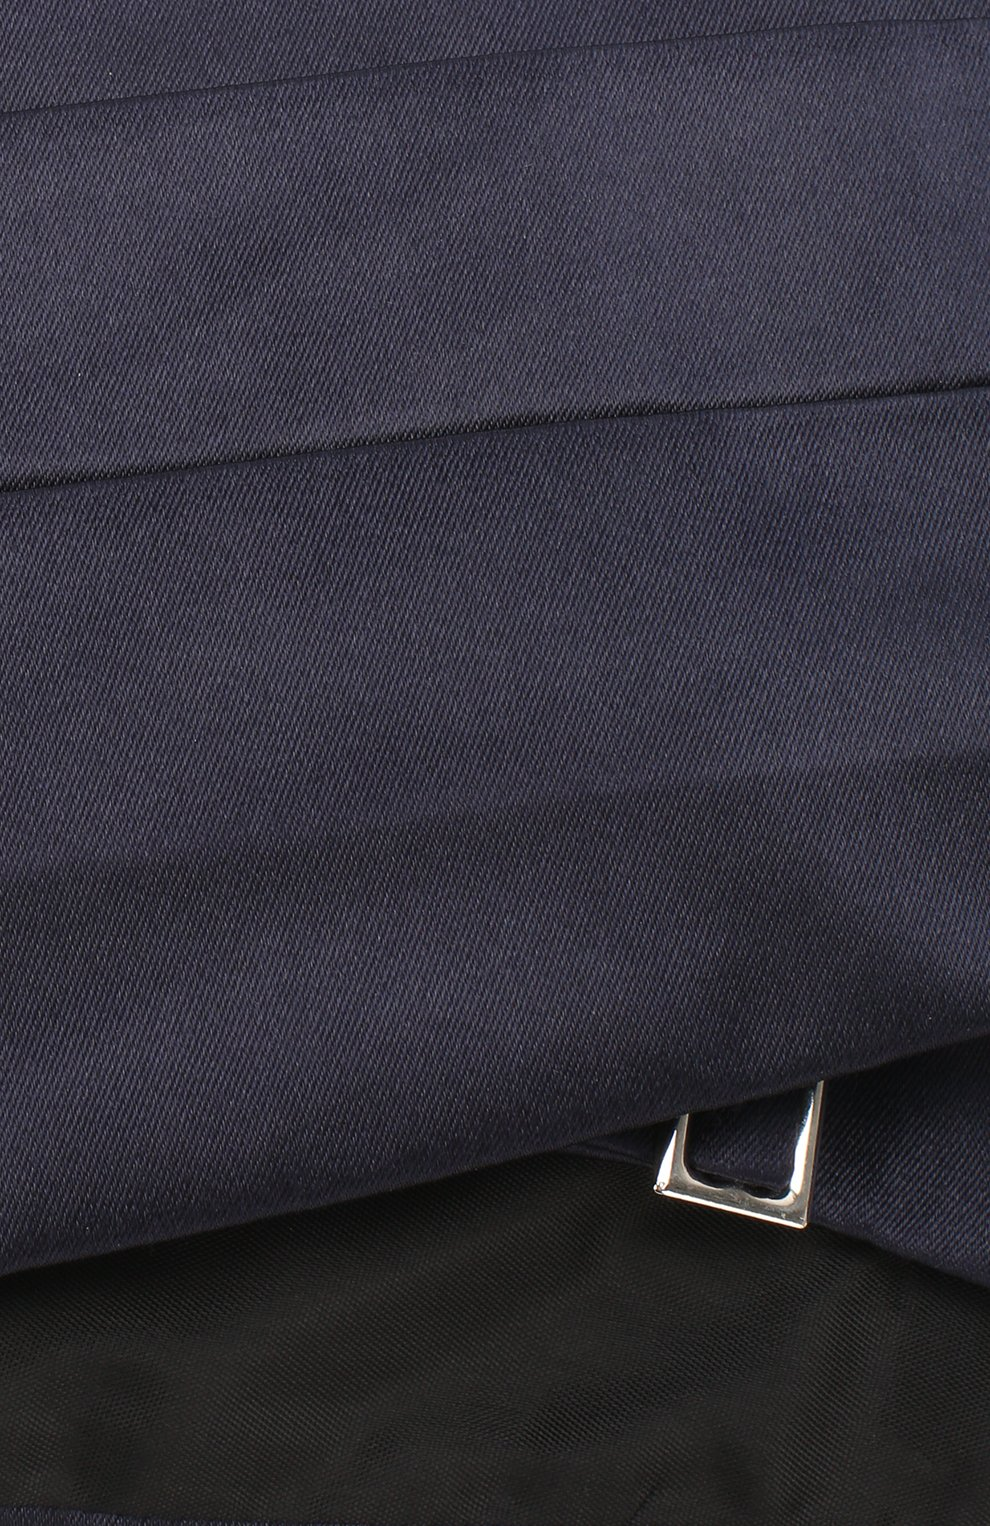 Мужской шелковый камербанд GIORGIO ARMANI темно-синего цвета, арт. 360033/7P998 | Фото 3